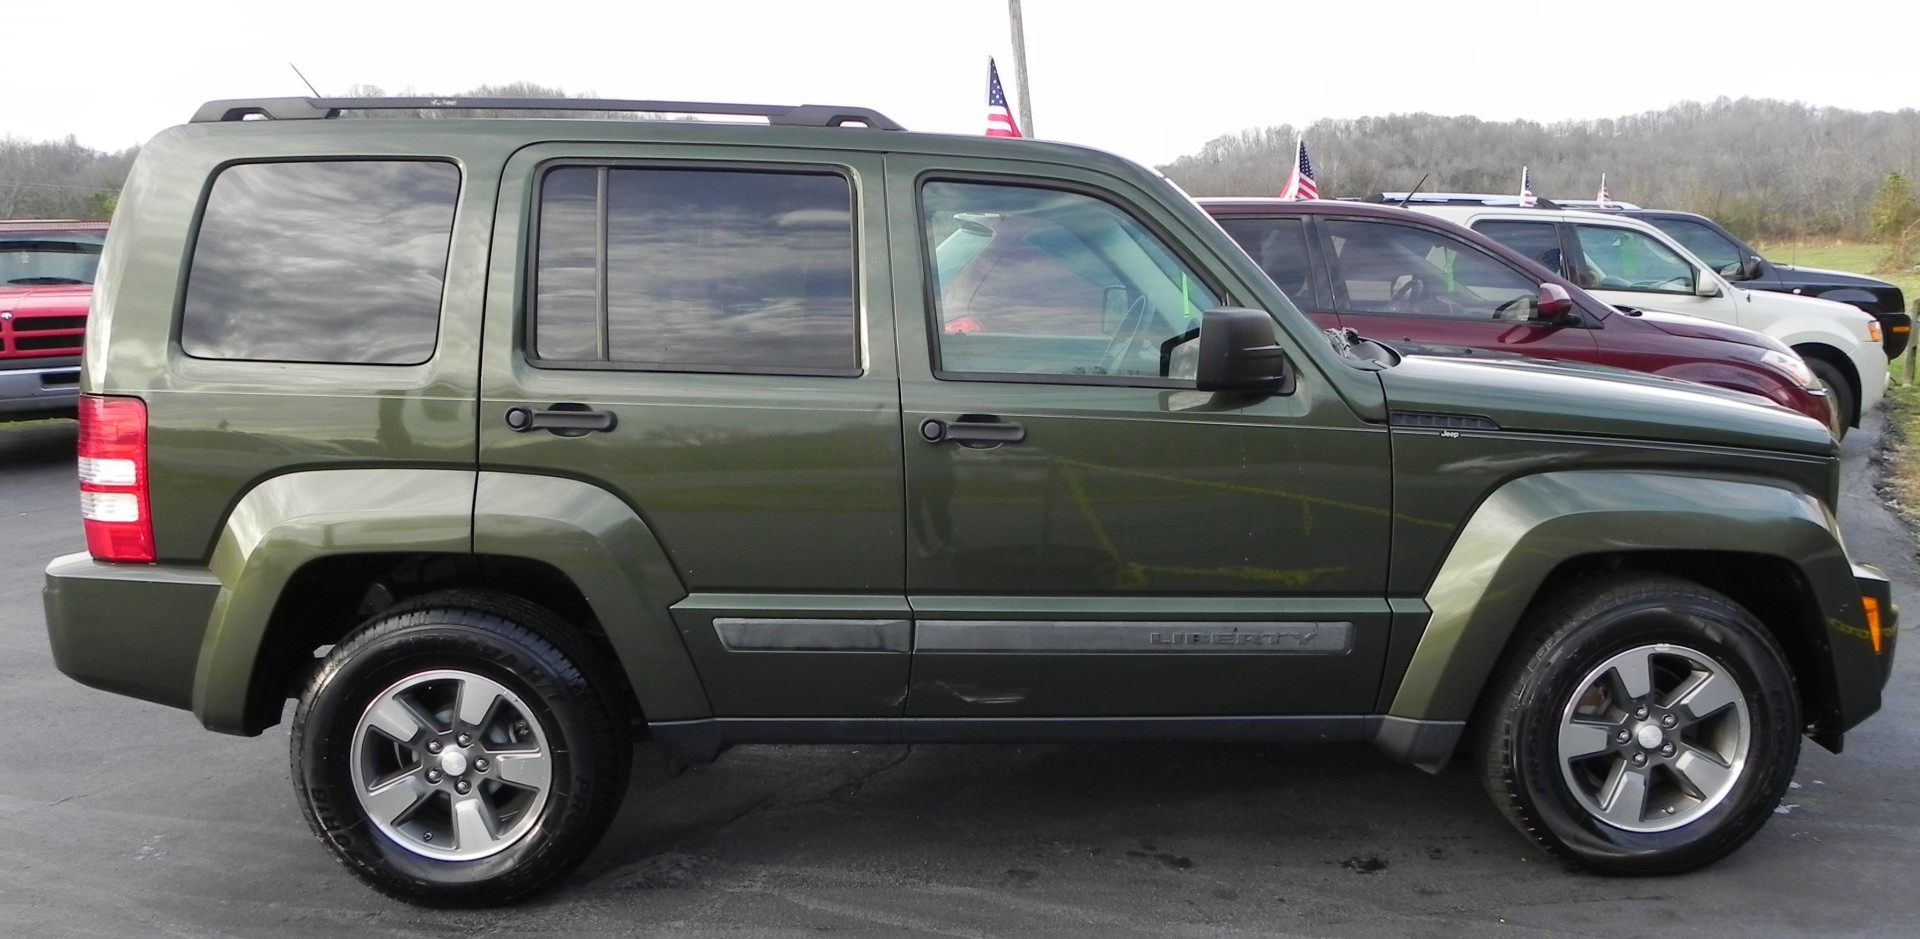 2008 Jeep Liberty 4x4